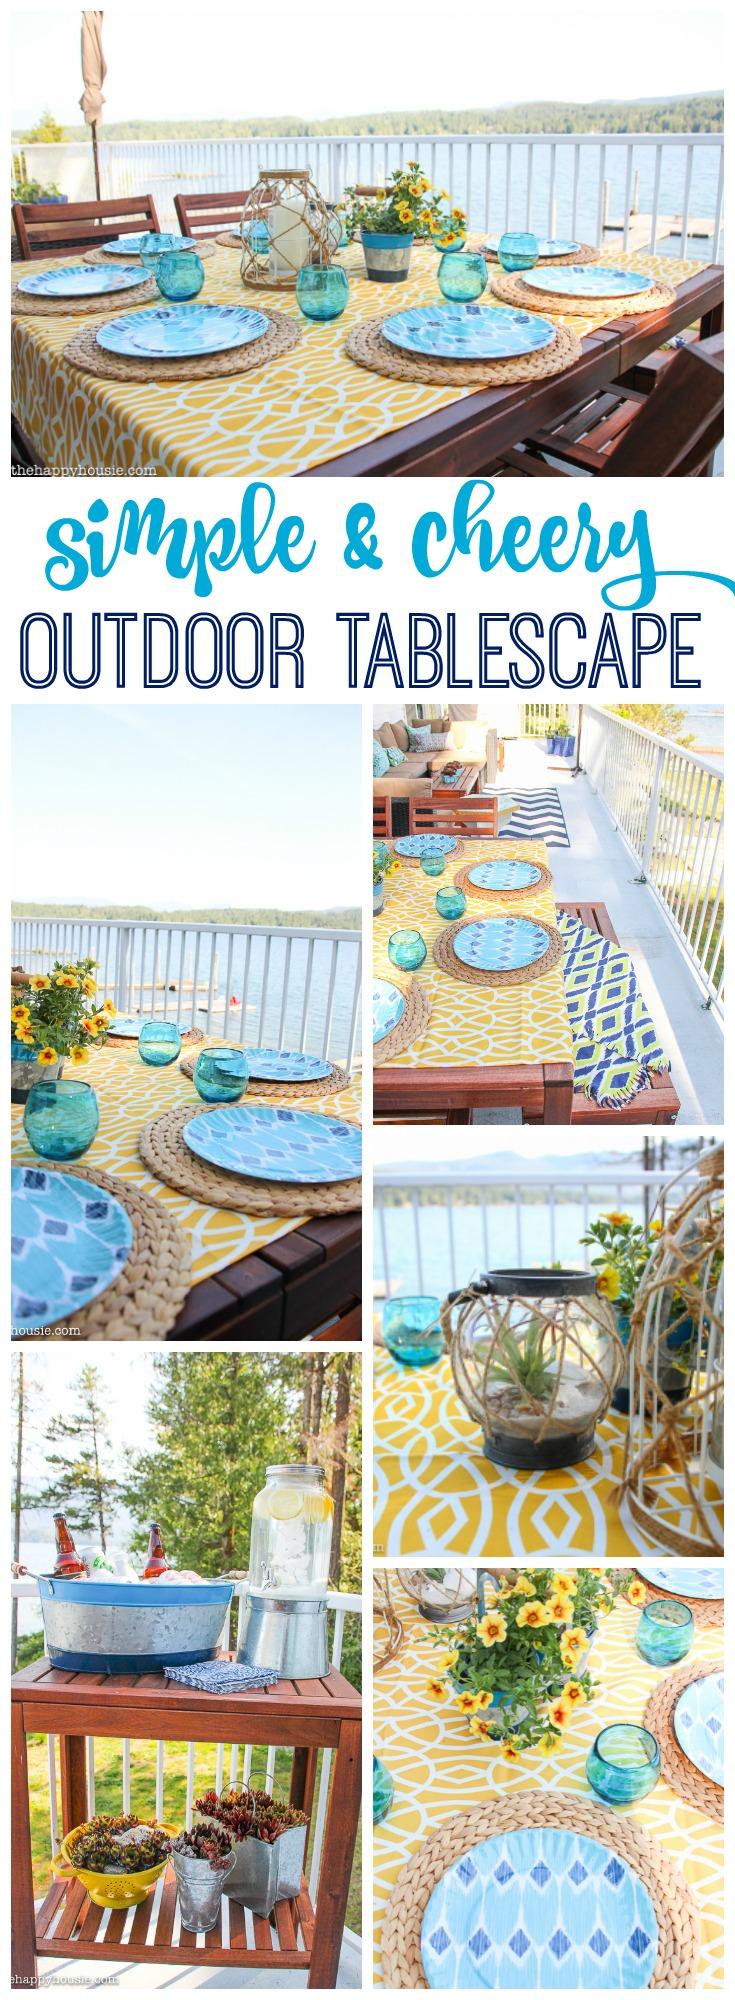 Simple and Cheery Outdoor Tablescape #alfrescoatlast